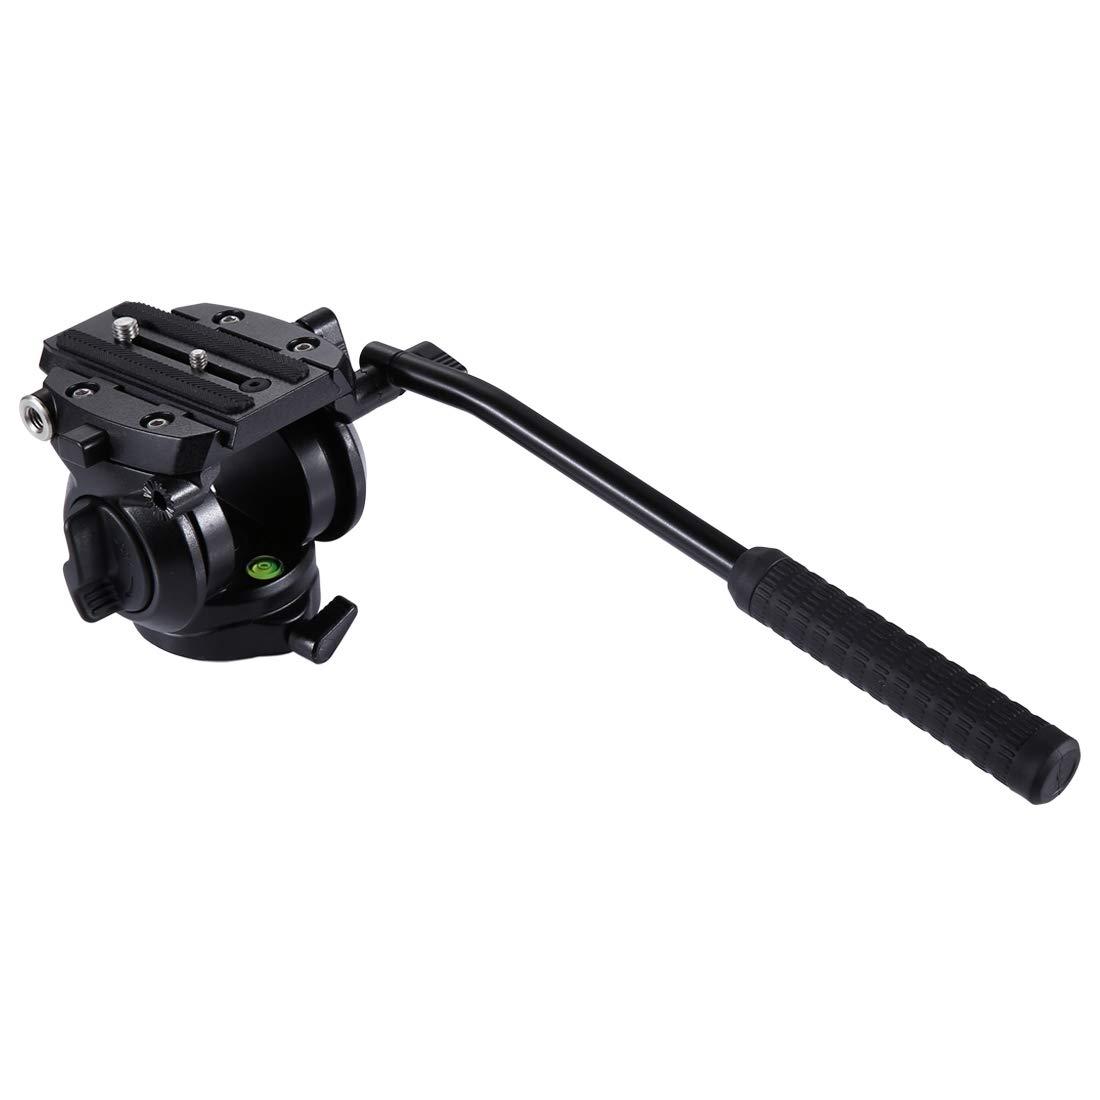 Dig ドッグボーン カメラアクセサリー 高耐久 ビデオカメラ 三脚 アクション 液体 ドラッグヘッド スライドプレート付き デジタル一眼レフ/一眼レフカメラ対応   B07L9WD2L4